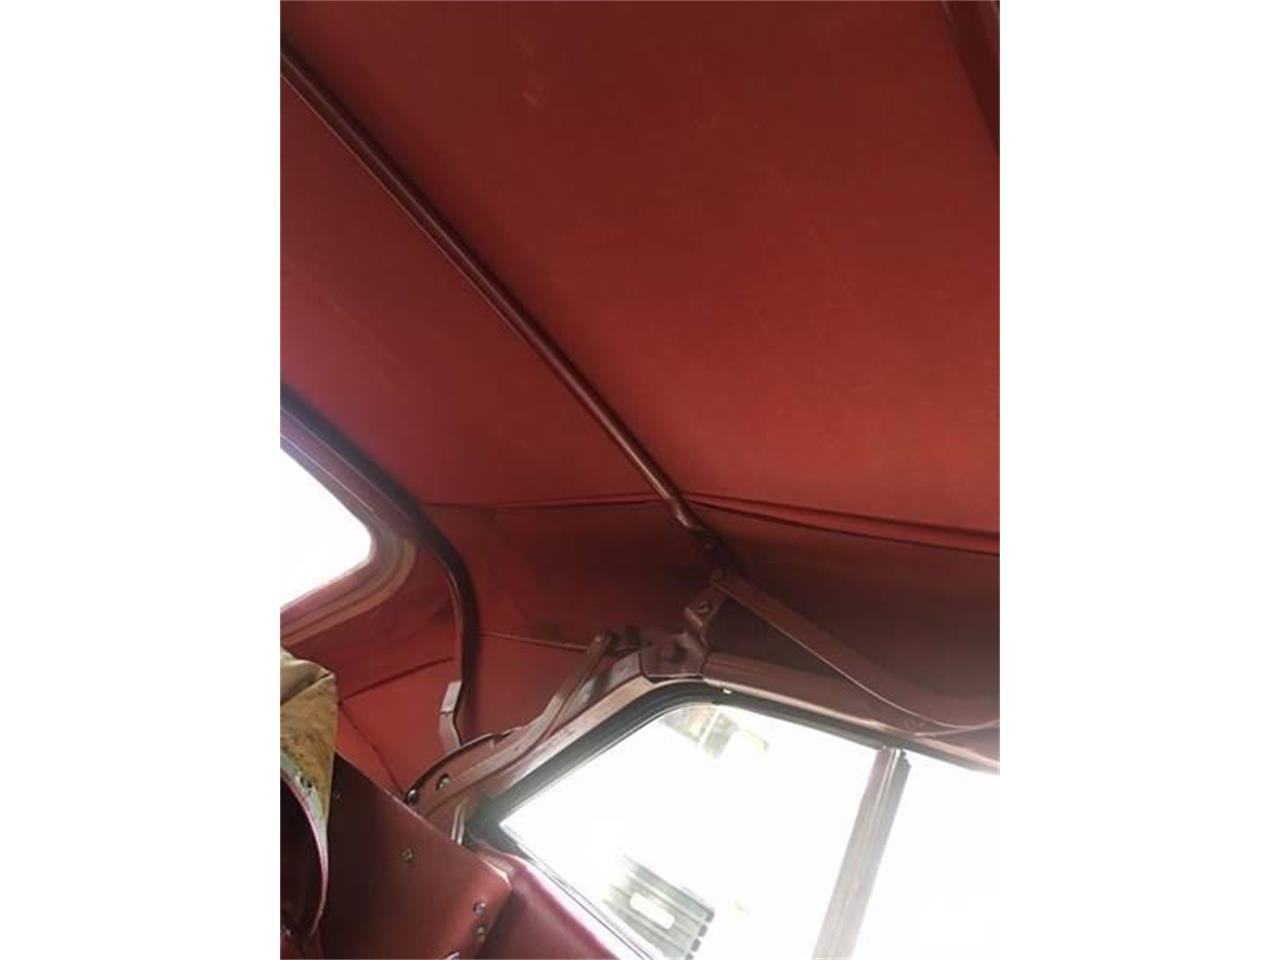 Large Picture of Classic '60 Pontiac Catalina - $42,500.00 - MFSH